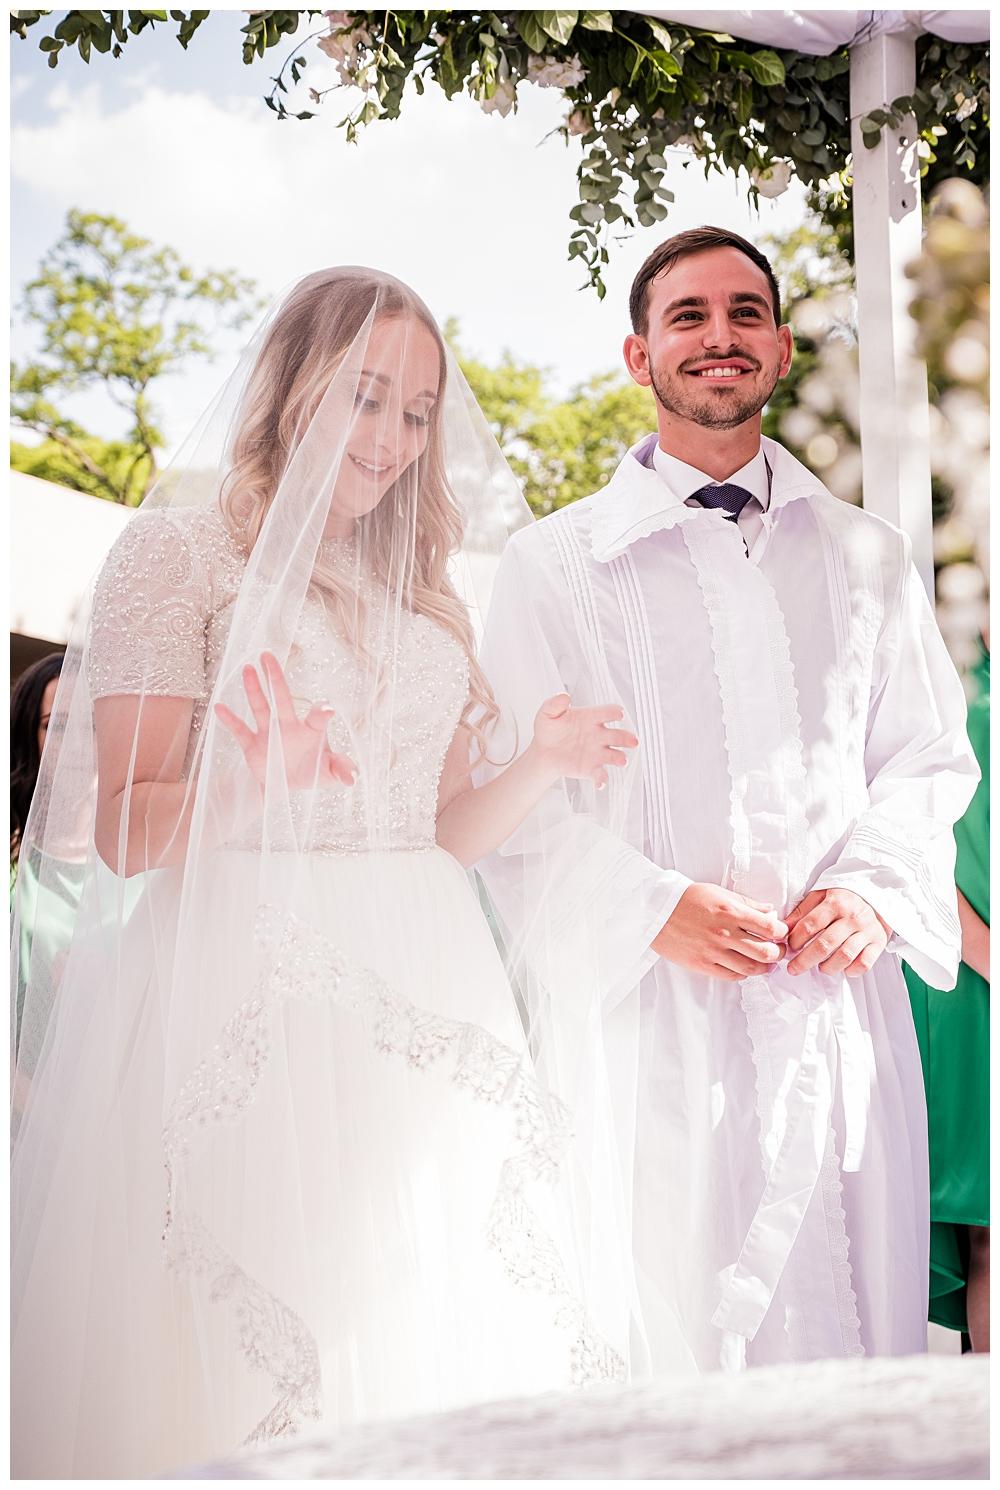 Best_Wedding_Photographer_AlexanderSmith_0635.jpg